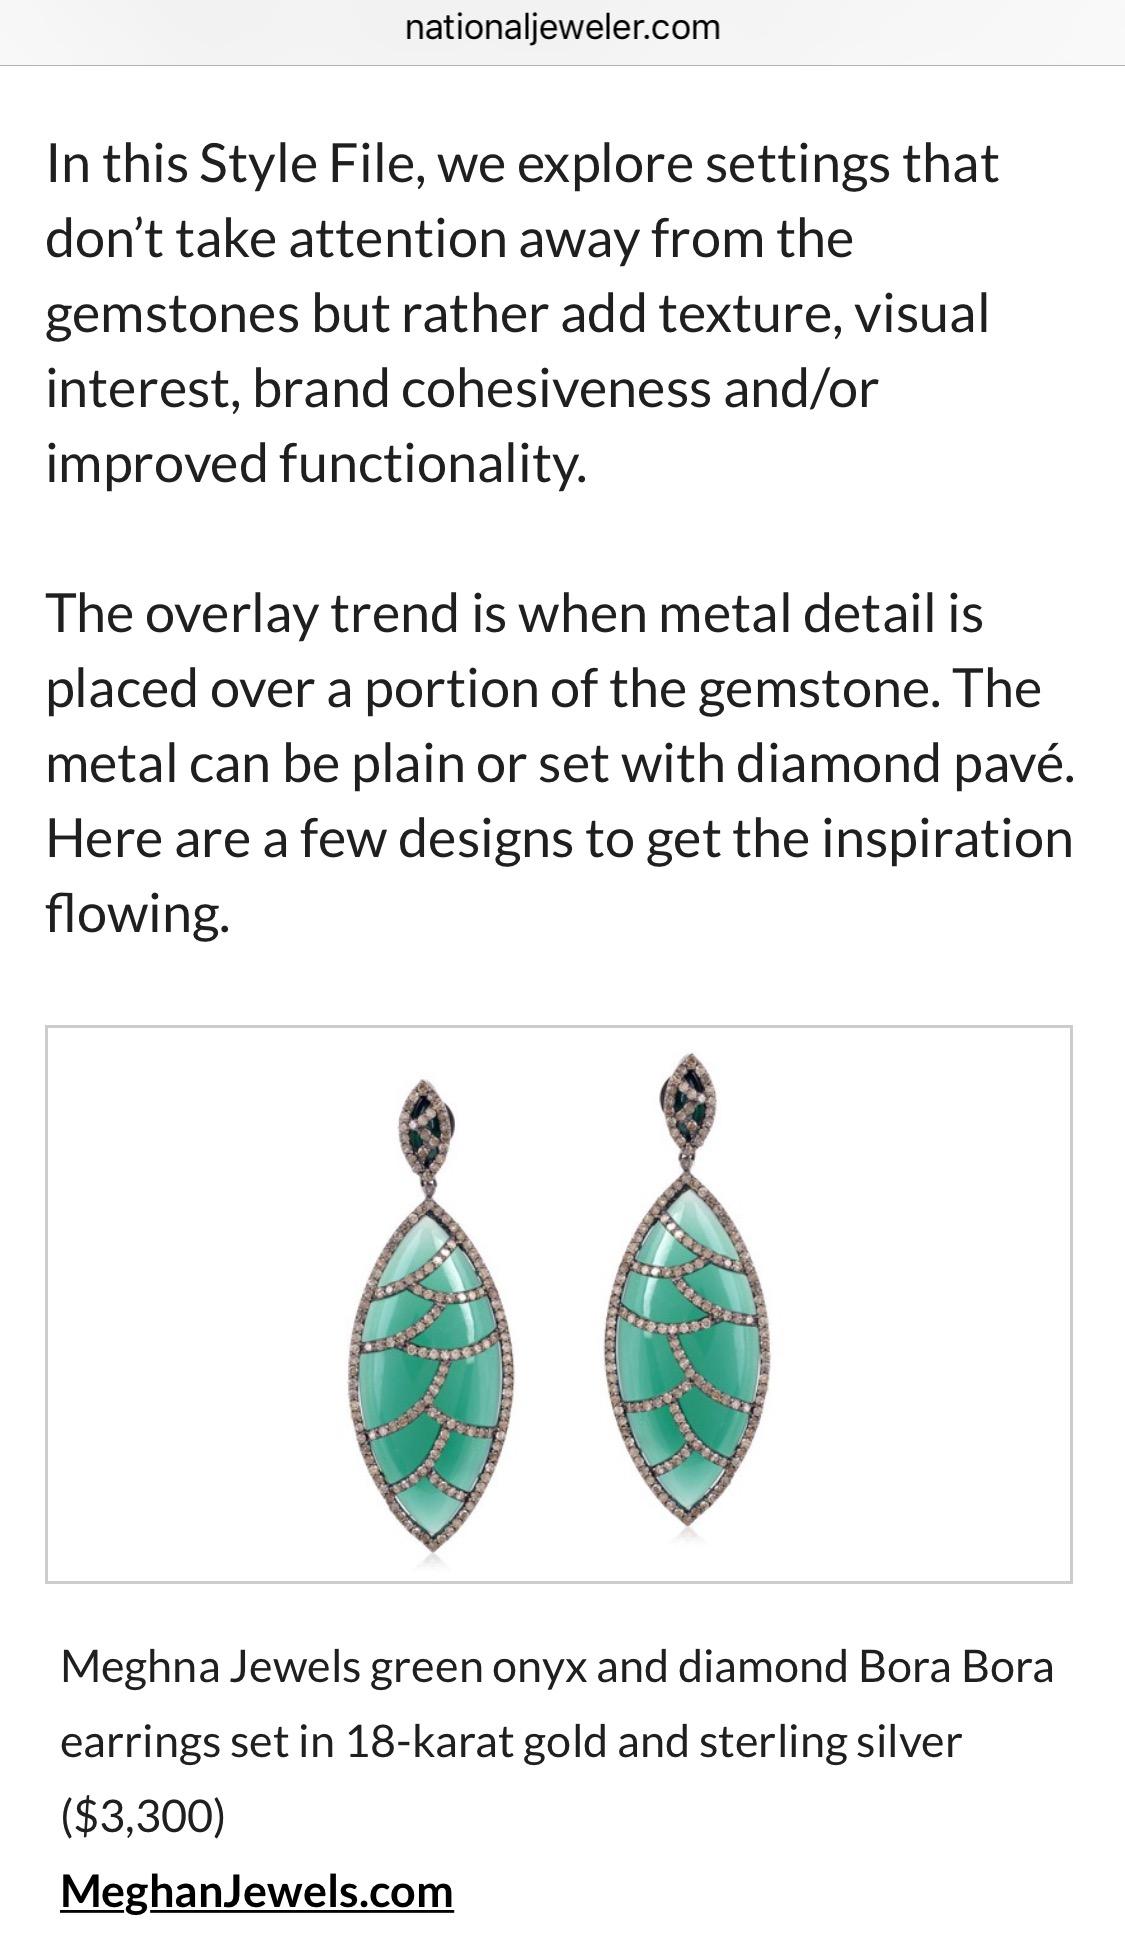 National Jeweler - Bora Bora Earrings